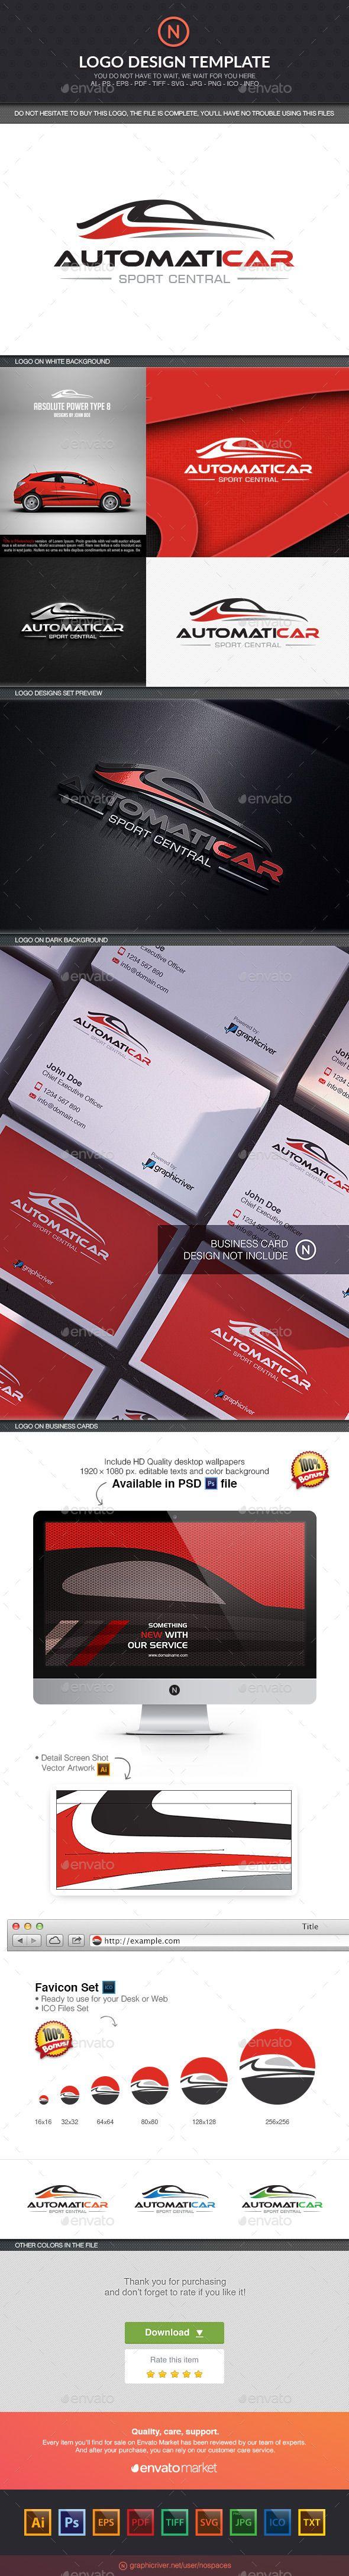 Automotive Line — Photoshop PSD #technology #web • Available here → https://graphicriver.net/item/automotive-line/10620519?ref=pxcr